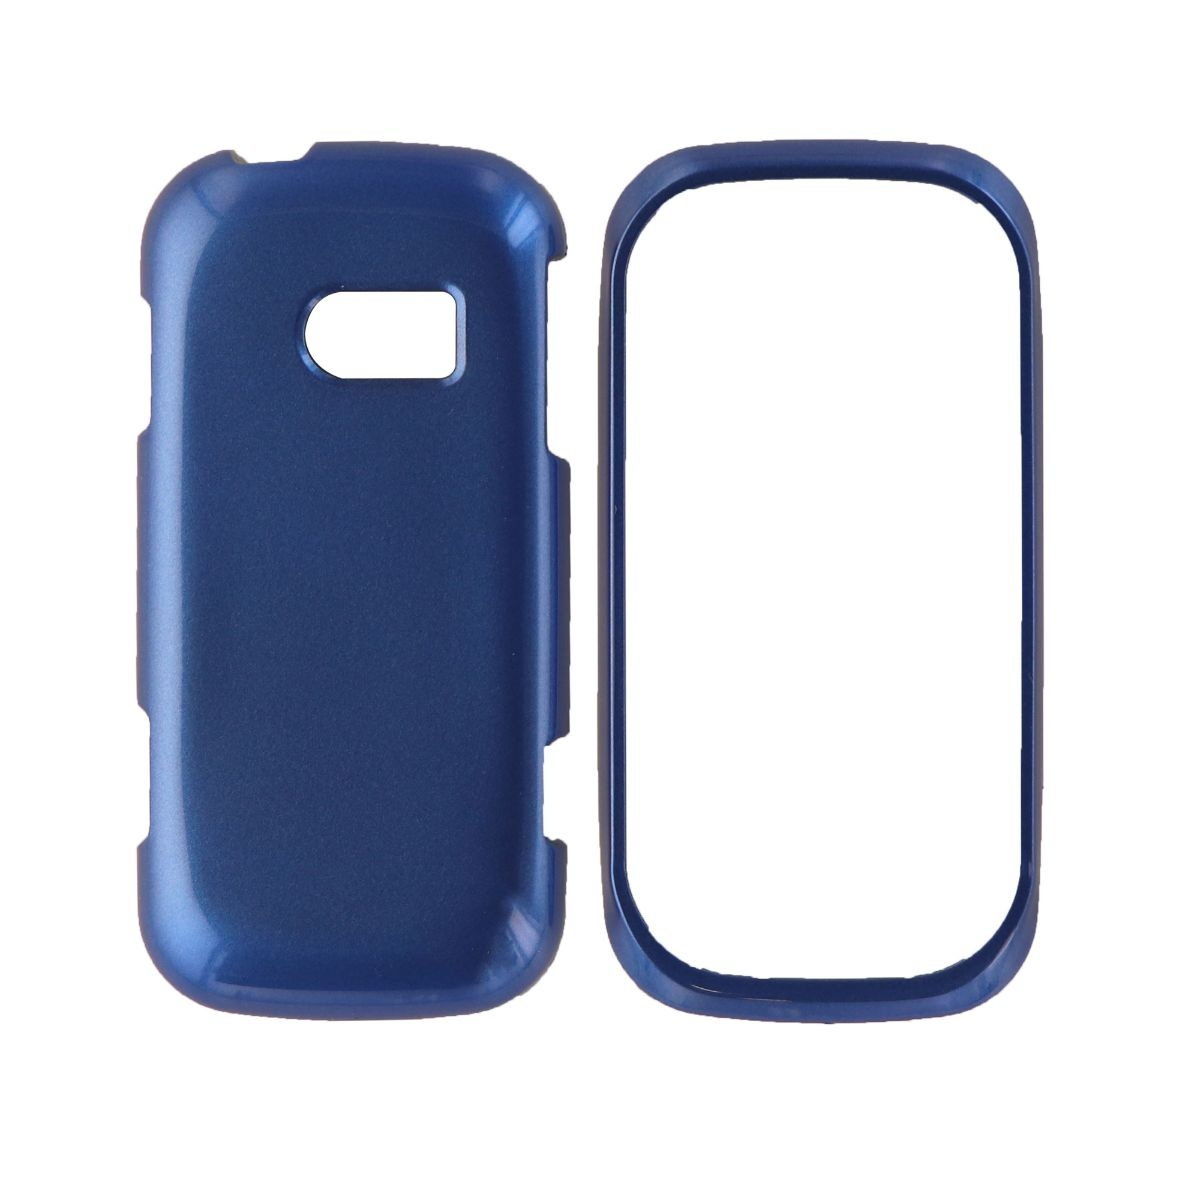 Verizon Snap on Hard Cover for LG Extravert 2 - Metallic Blue